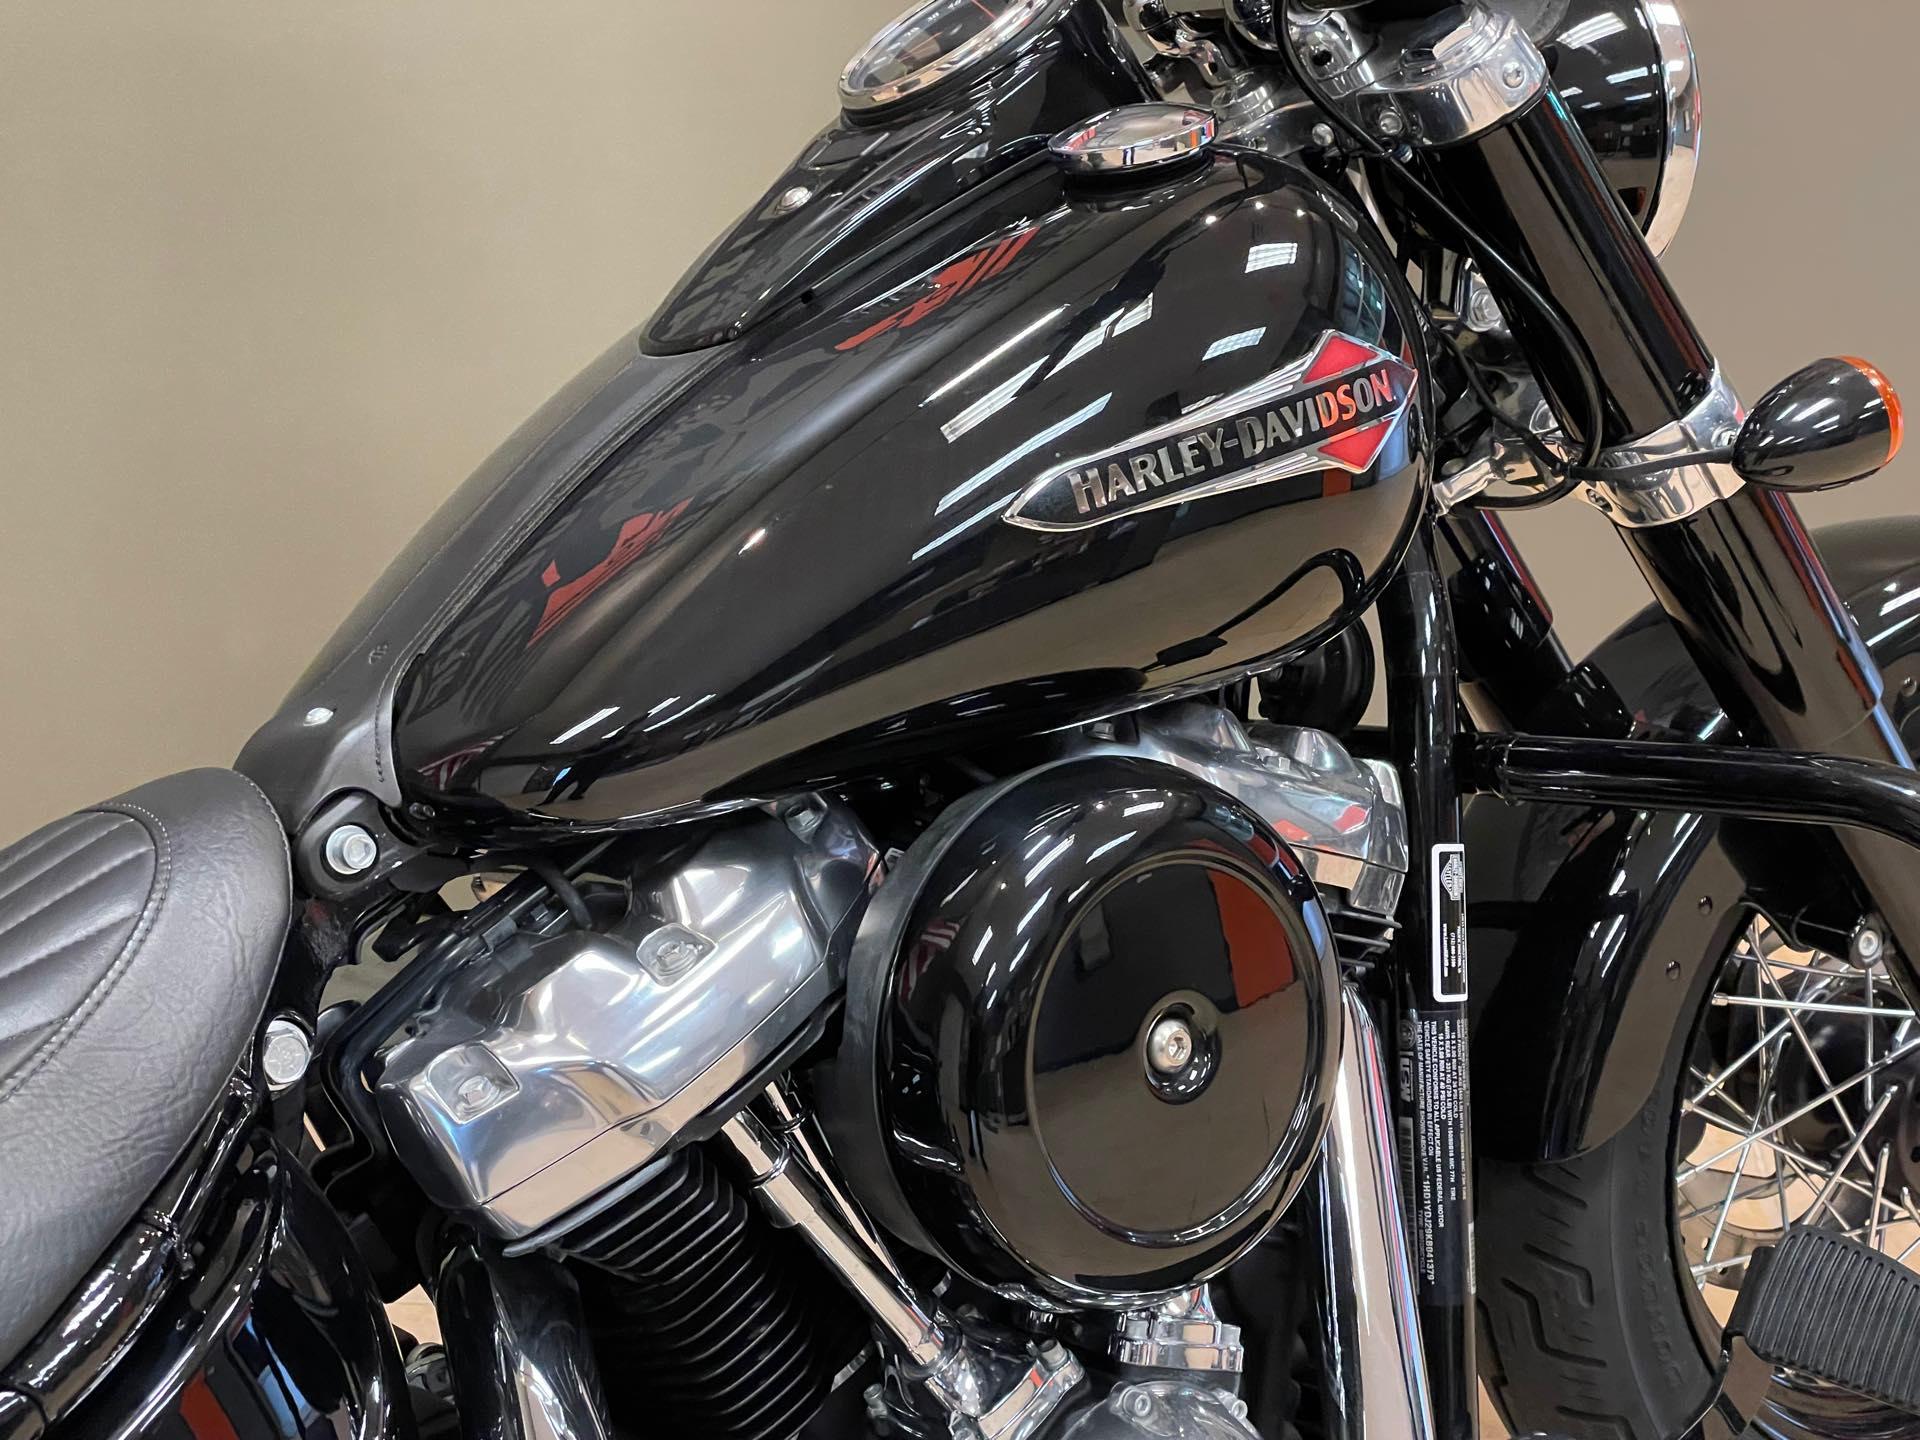 2019 Harley-Davidson Softail Slim at Loess Hills Harley-Davidson